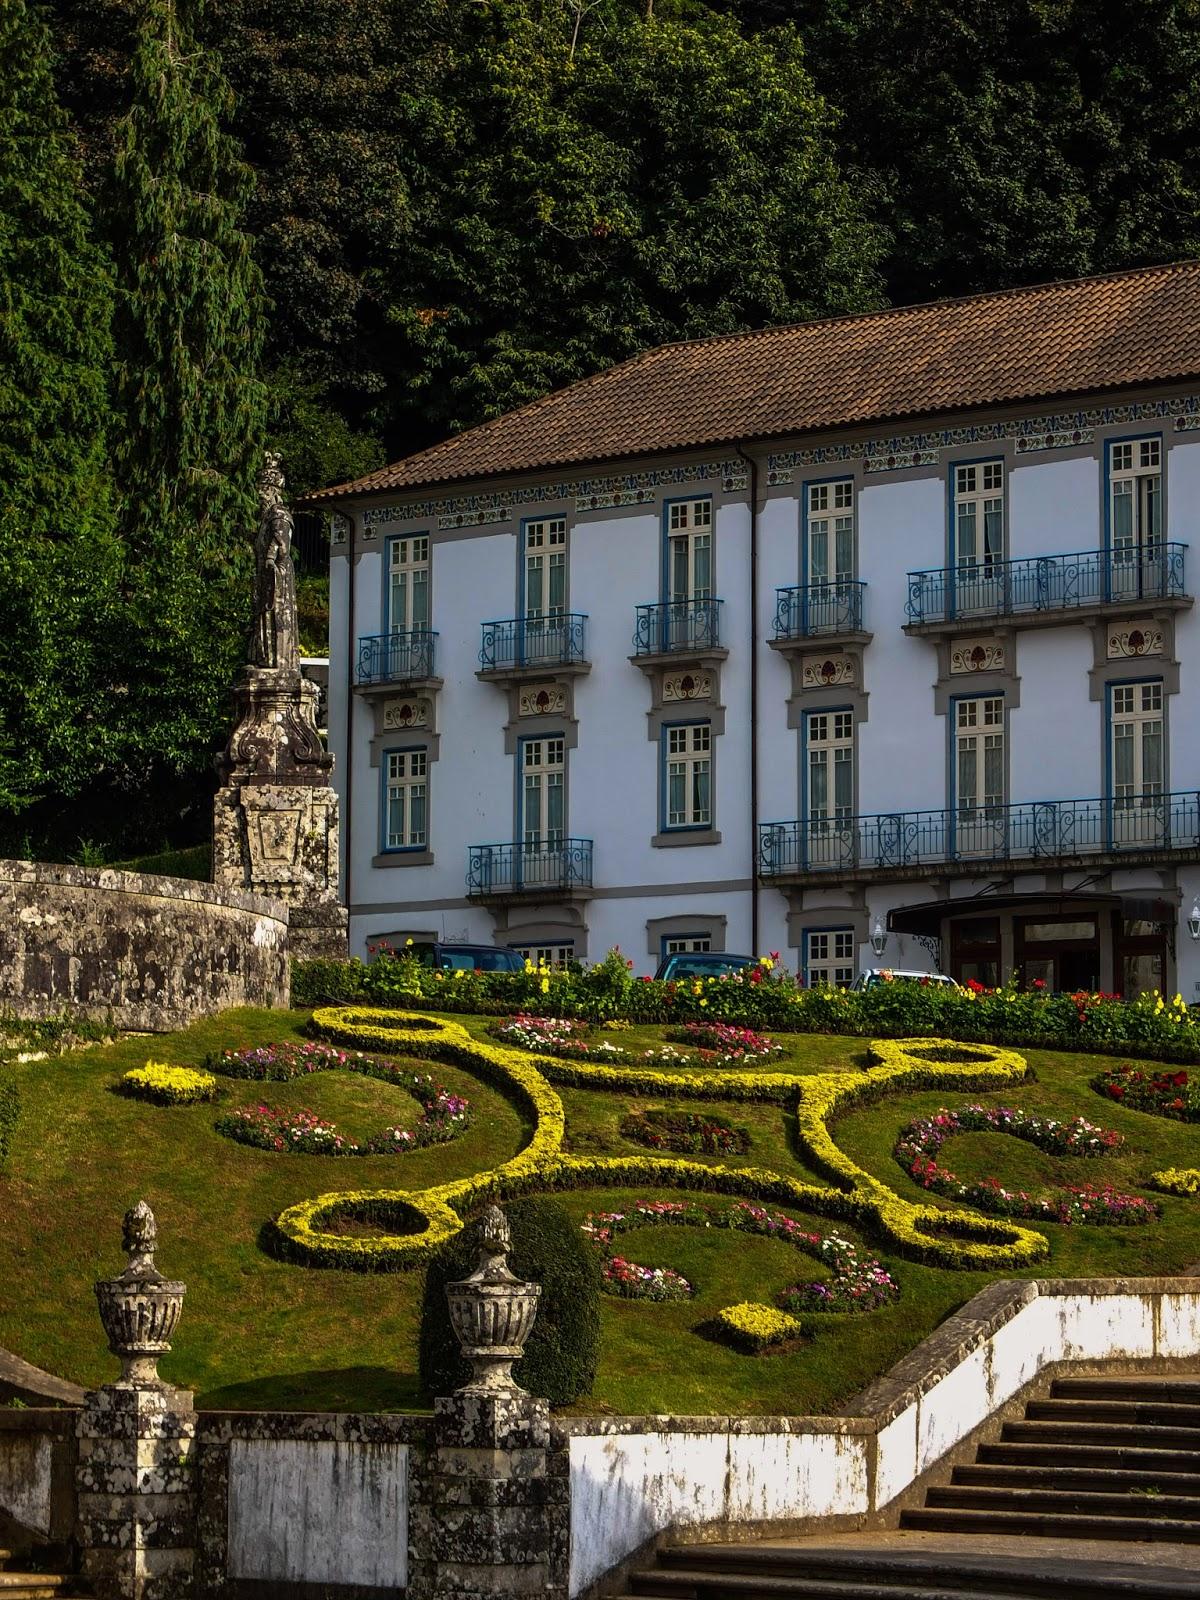 Beautiful garden designs at the Bom Jesus do Monte Sanctuary.